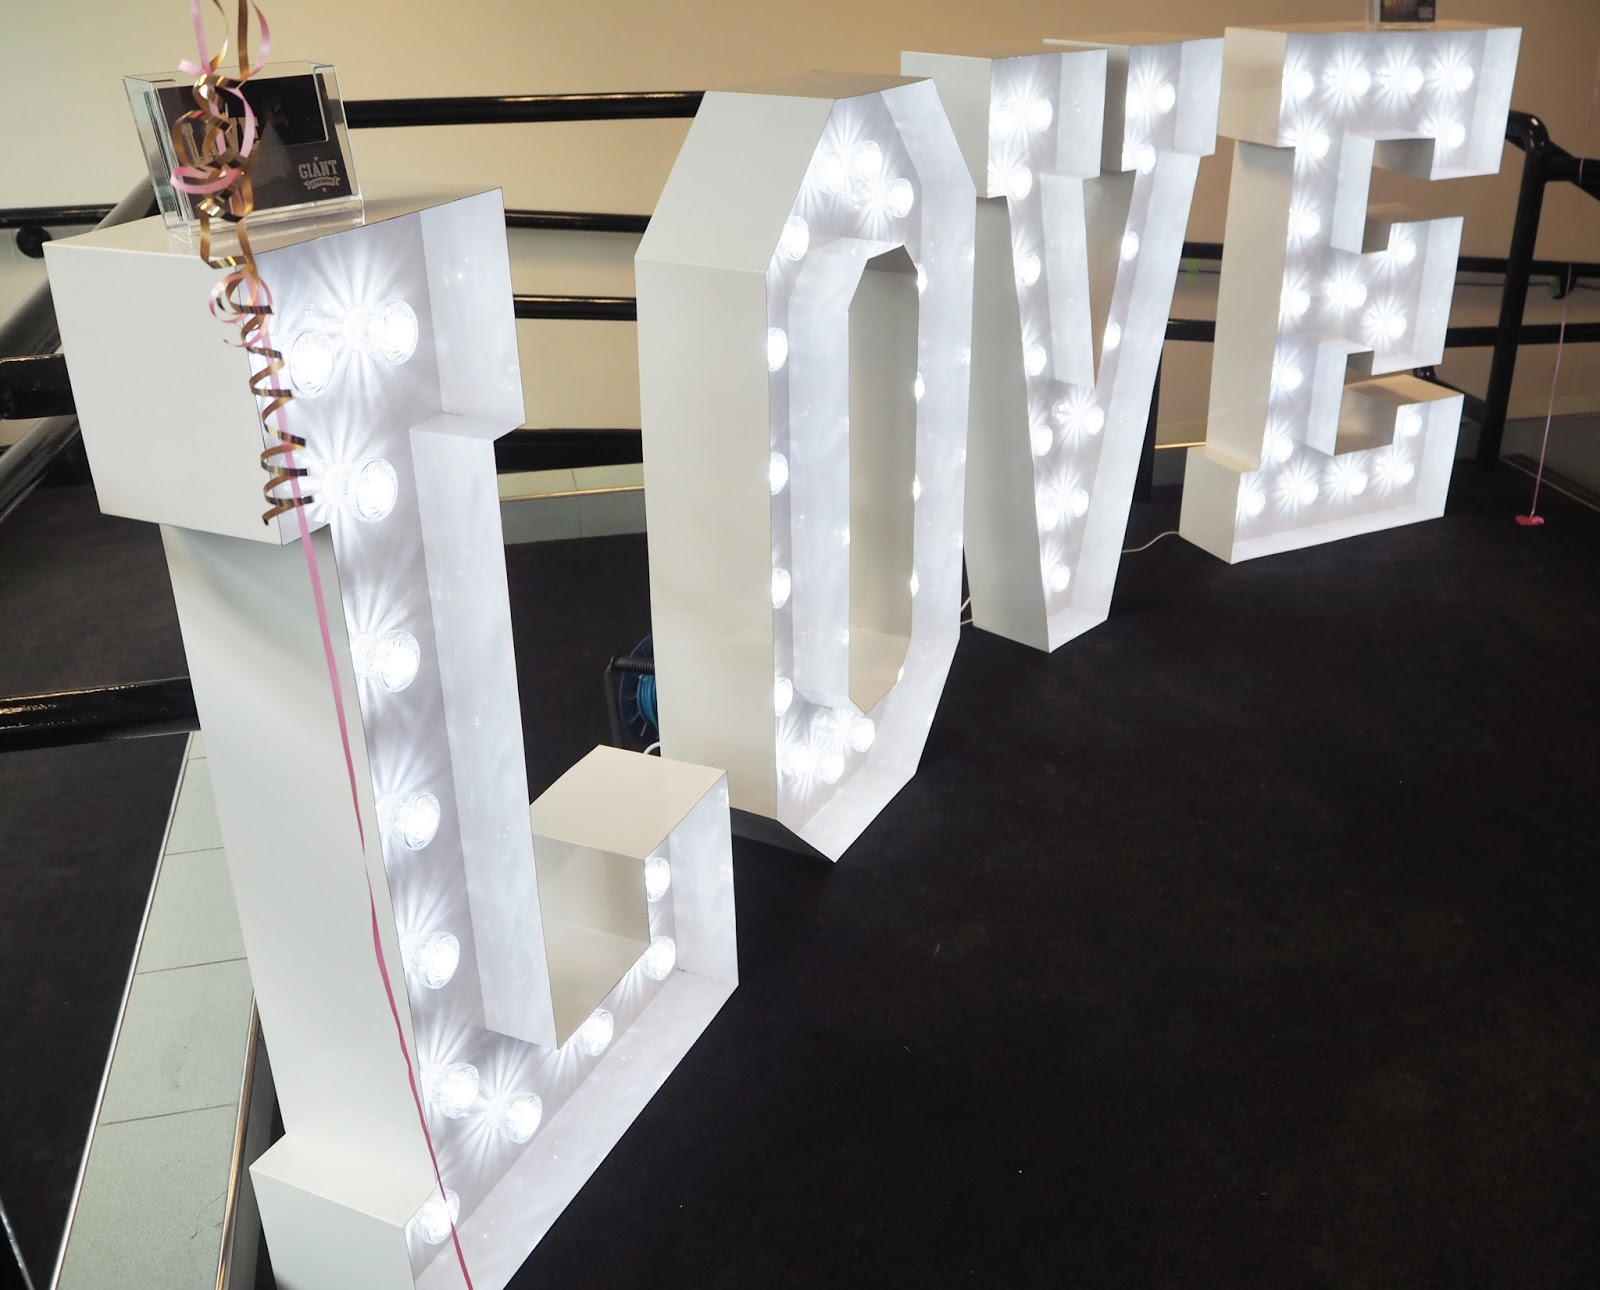 The Fairytale Fair Handmade Wedding Fair, Katie Kirk Loves, UK Blogger, Brighton Blogger, West Sussex Blogger, Support Handmade, Handmade in the UK, Handmade Wedding, Wedding Ideas, Wedding Inspiration, Etsy Sellers, Wedding Fair, Wedding Accessories, Wedding Cakes, Wedding Bouquets, Sussex Wedding, Handmade Is Better, Craft Blogger, Small Business, Shop Small, Wedding Invitations, Wedding Favours, Wedding Planning, Wedding Crafts